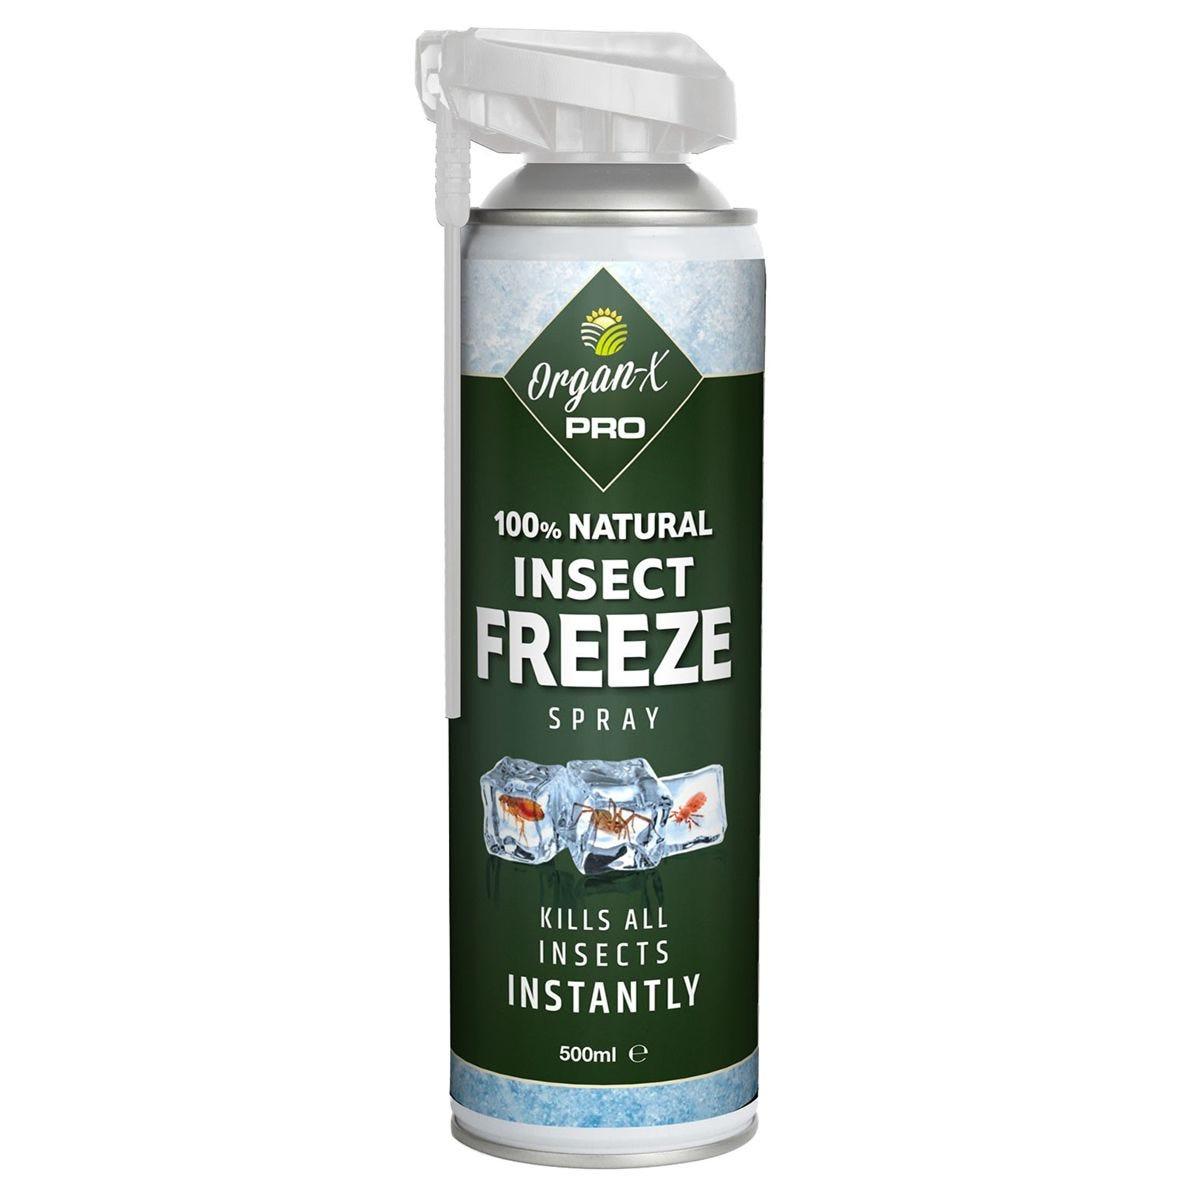 Organ-X Pro Insect Freeze Spray - 500ml